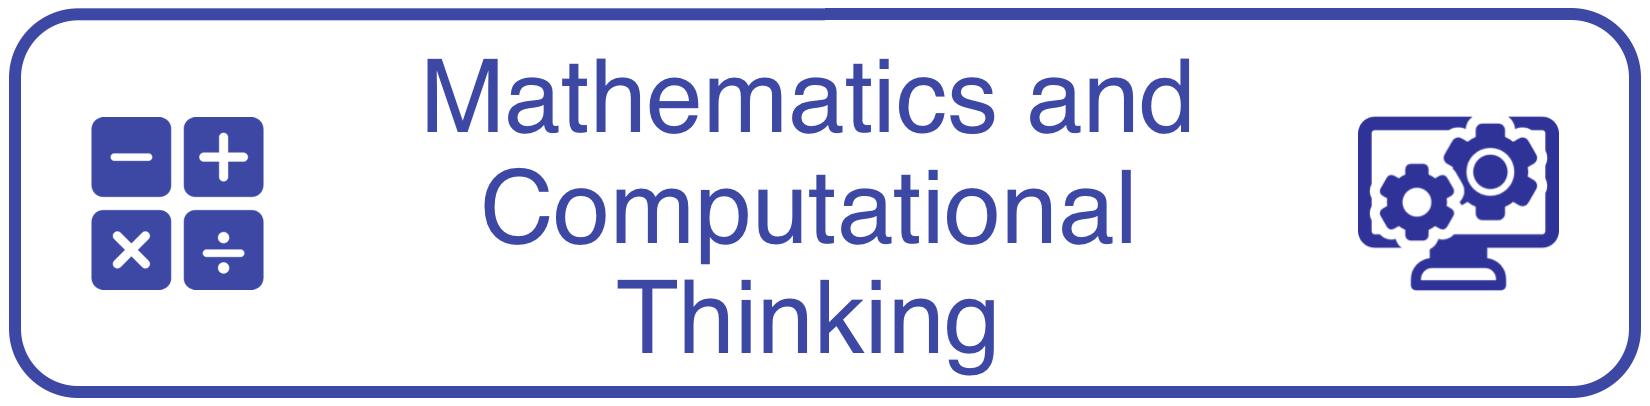 Mathematics_and_Computational_Thinking.png